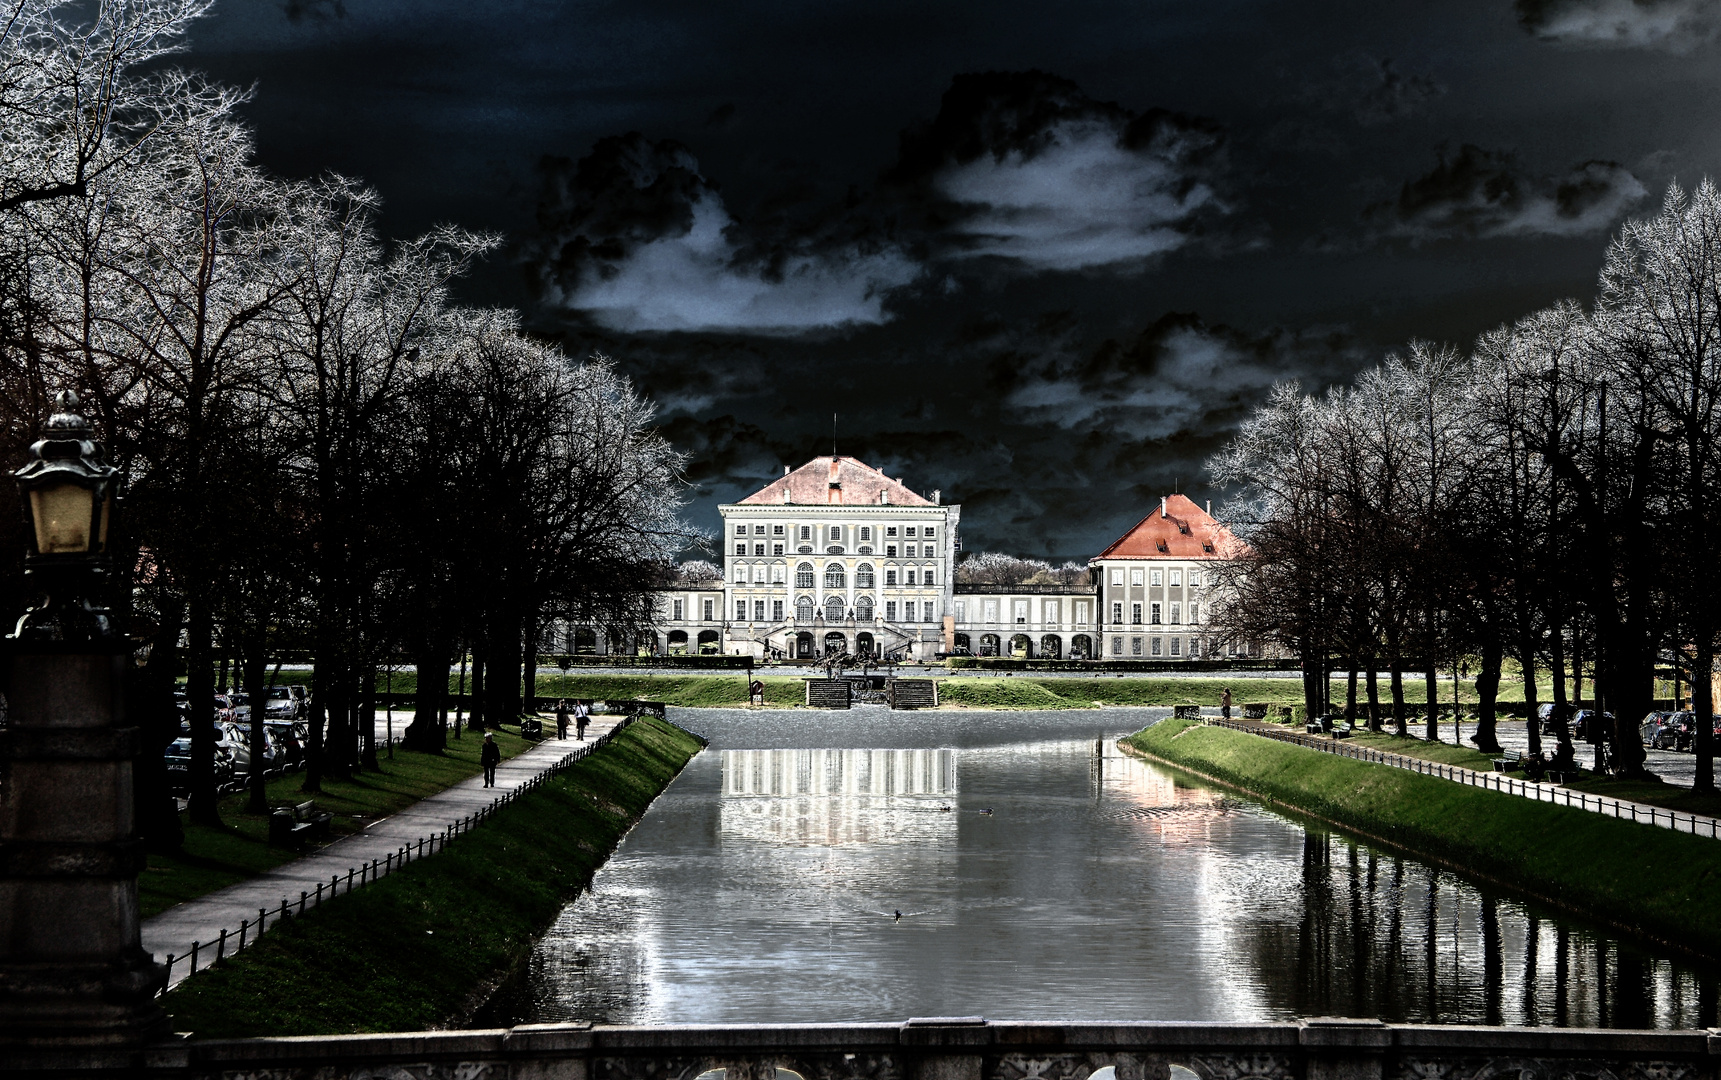 Schloss Nymphenburg mal anders